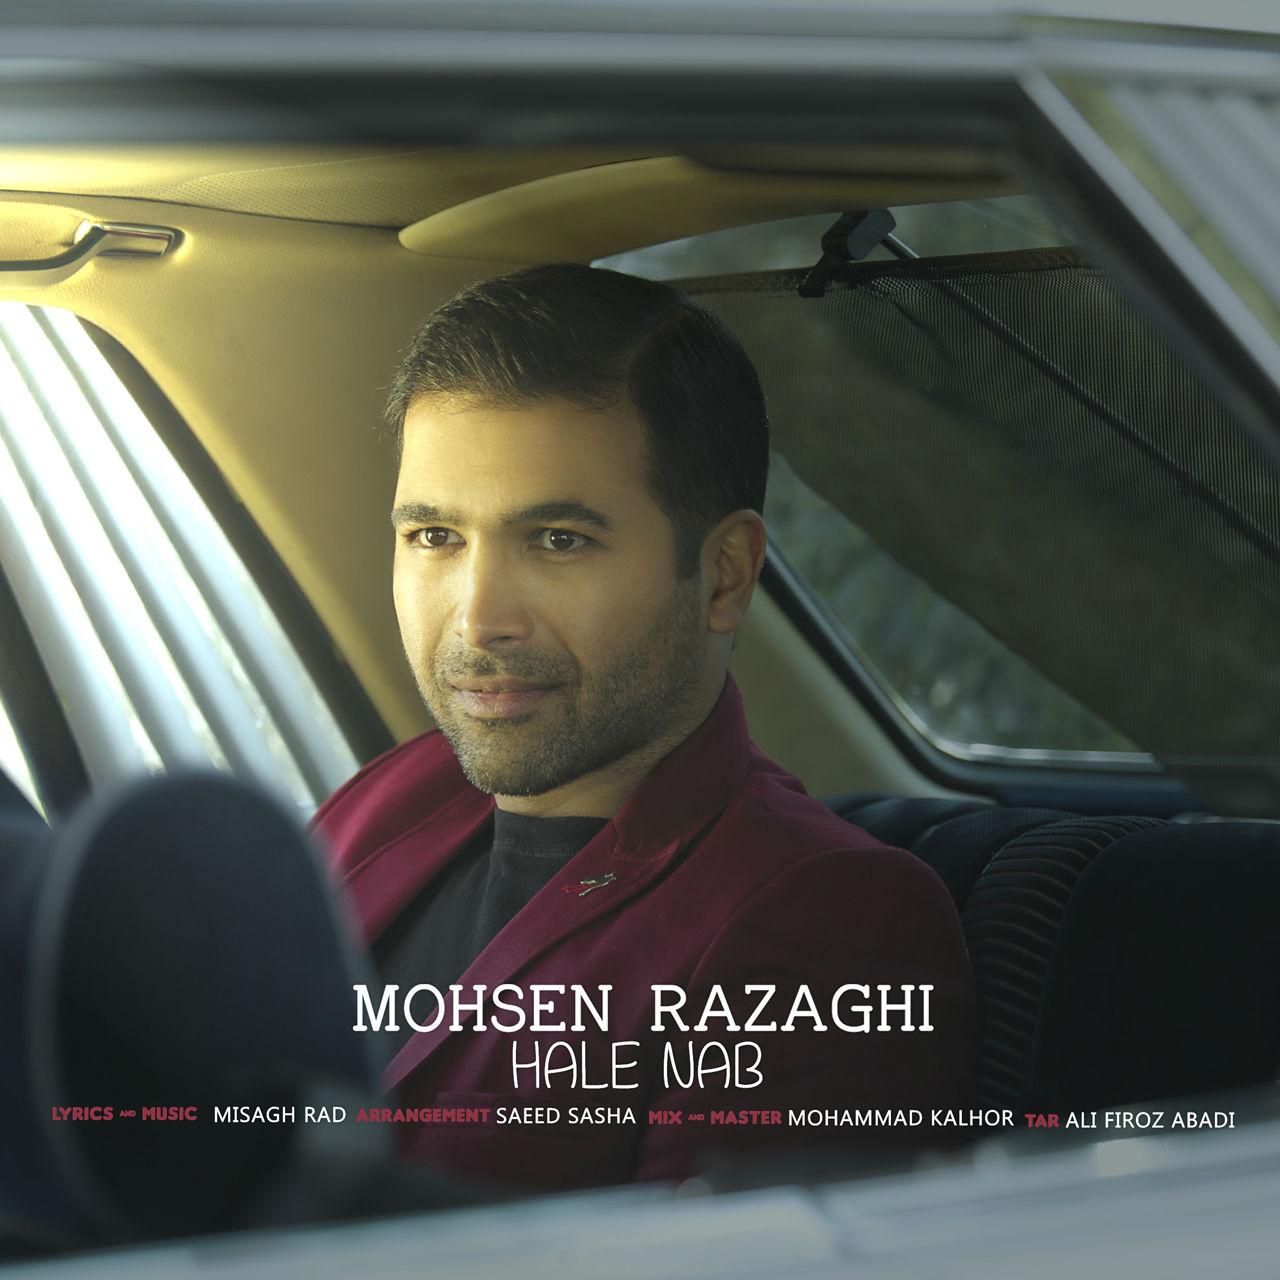 Mohsen Razaghi – Hale Nab